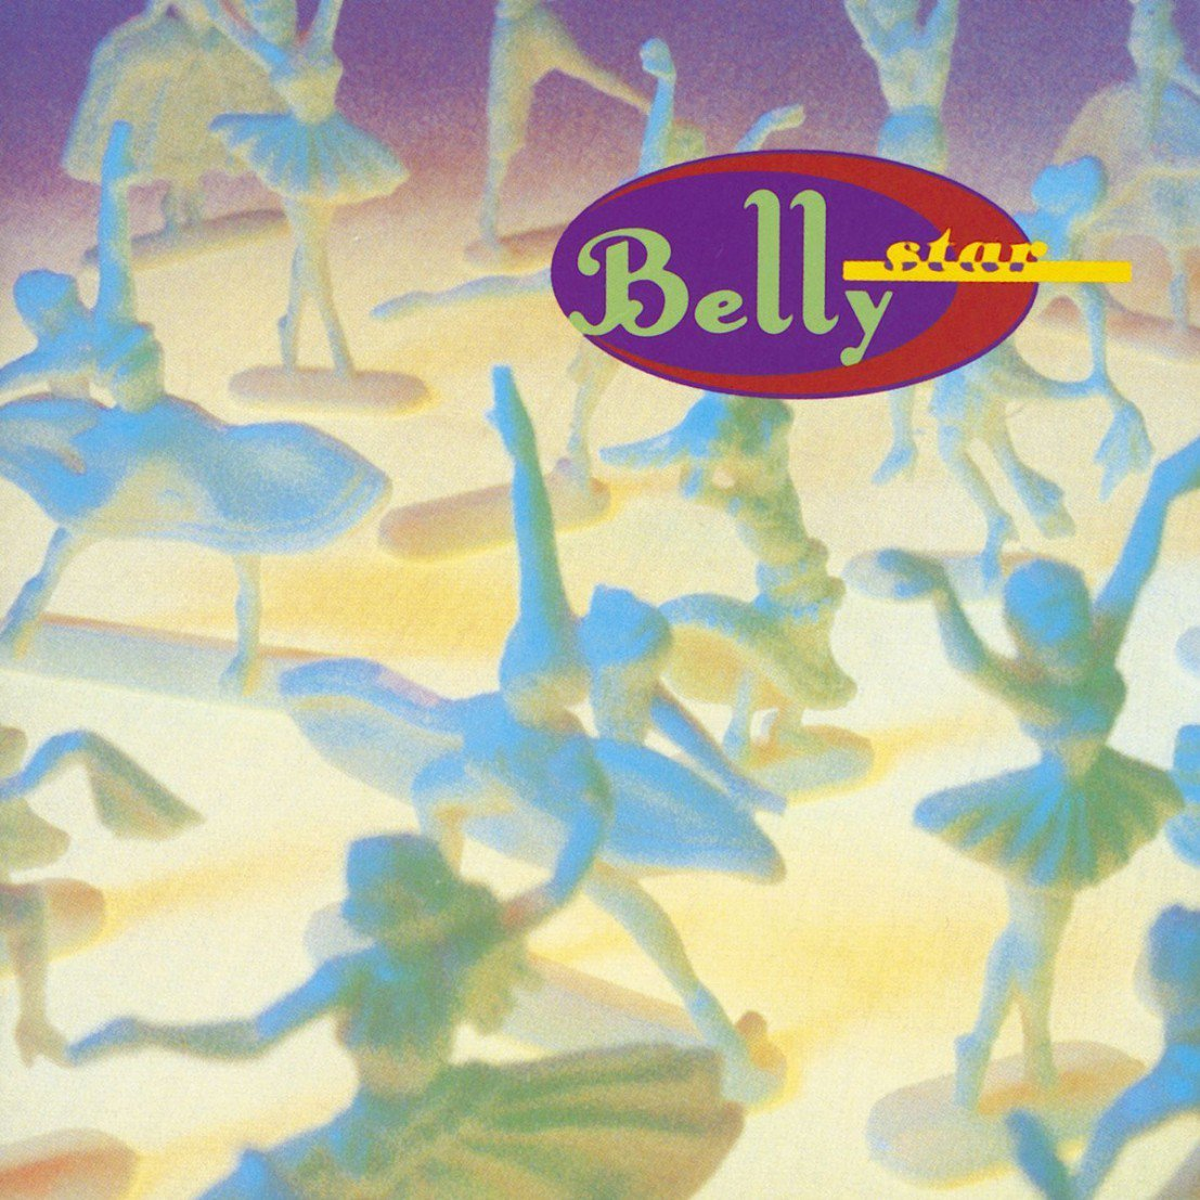 Review: Belly, Star - Slant Magazine